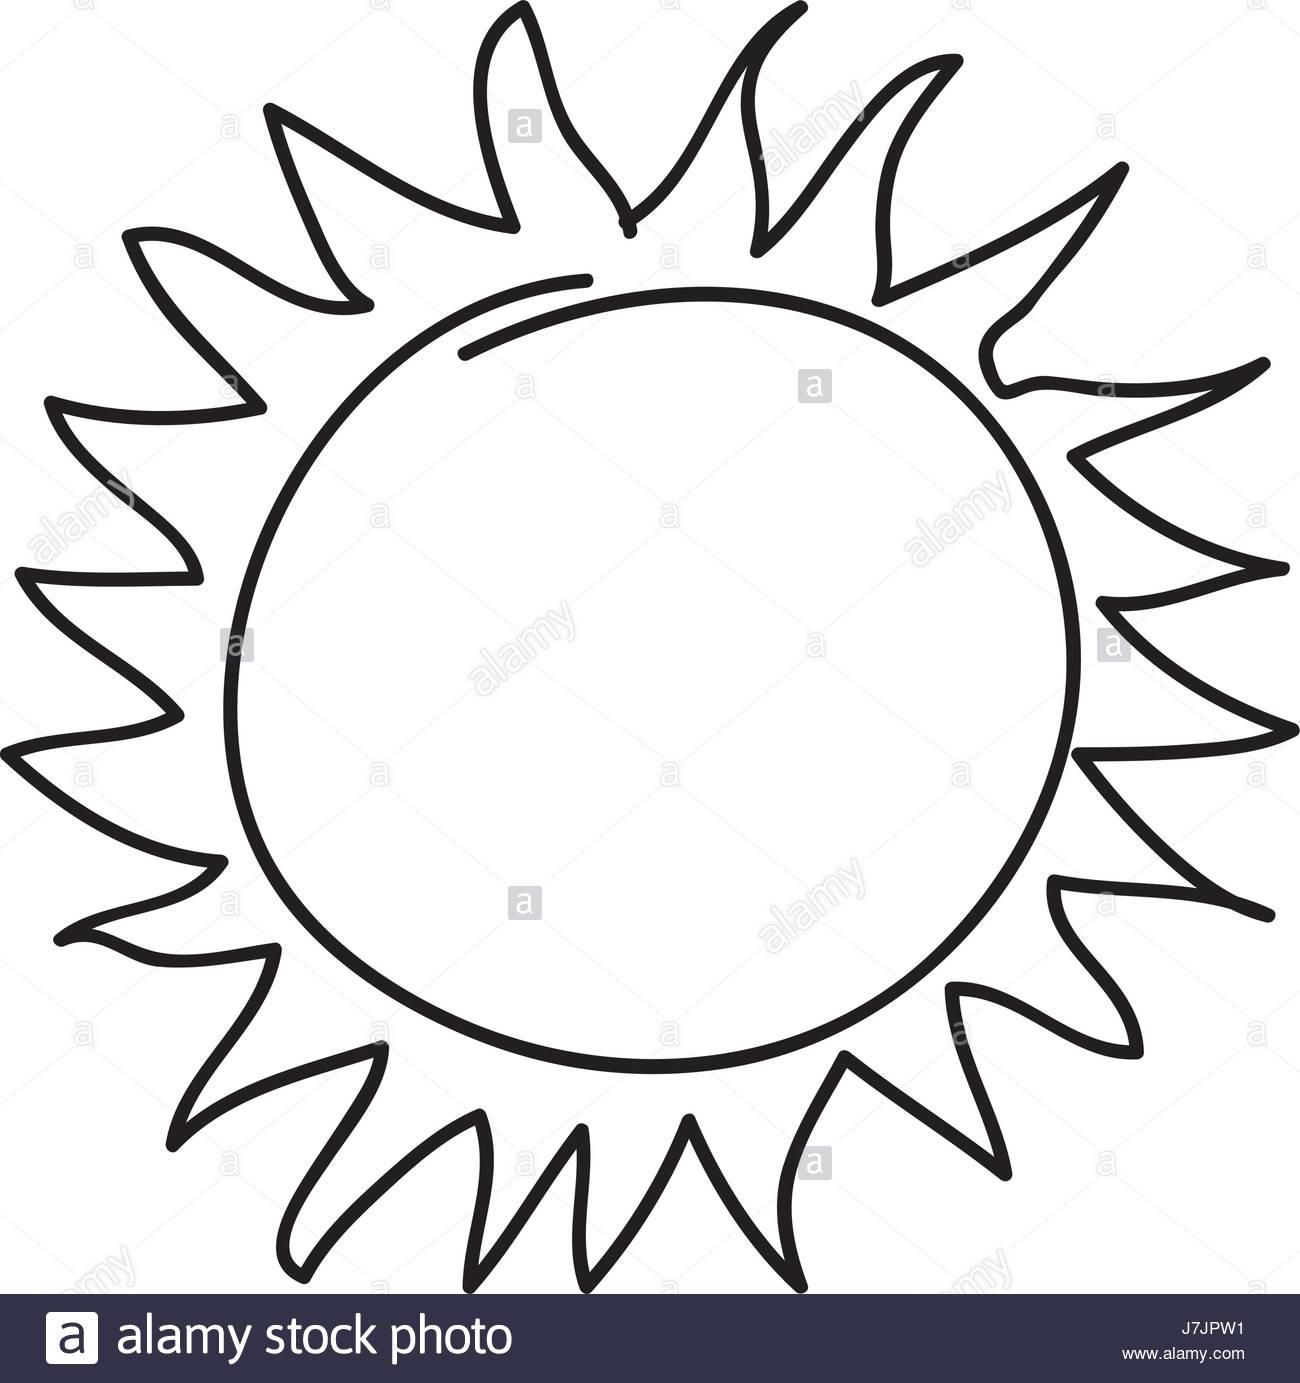 1300x1383 Summer Sun Drawing Icon Stock Vector Art Amp Illustration, Vector